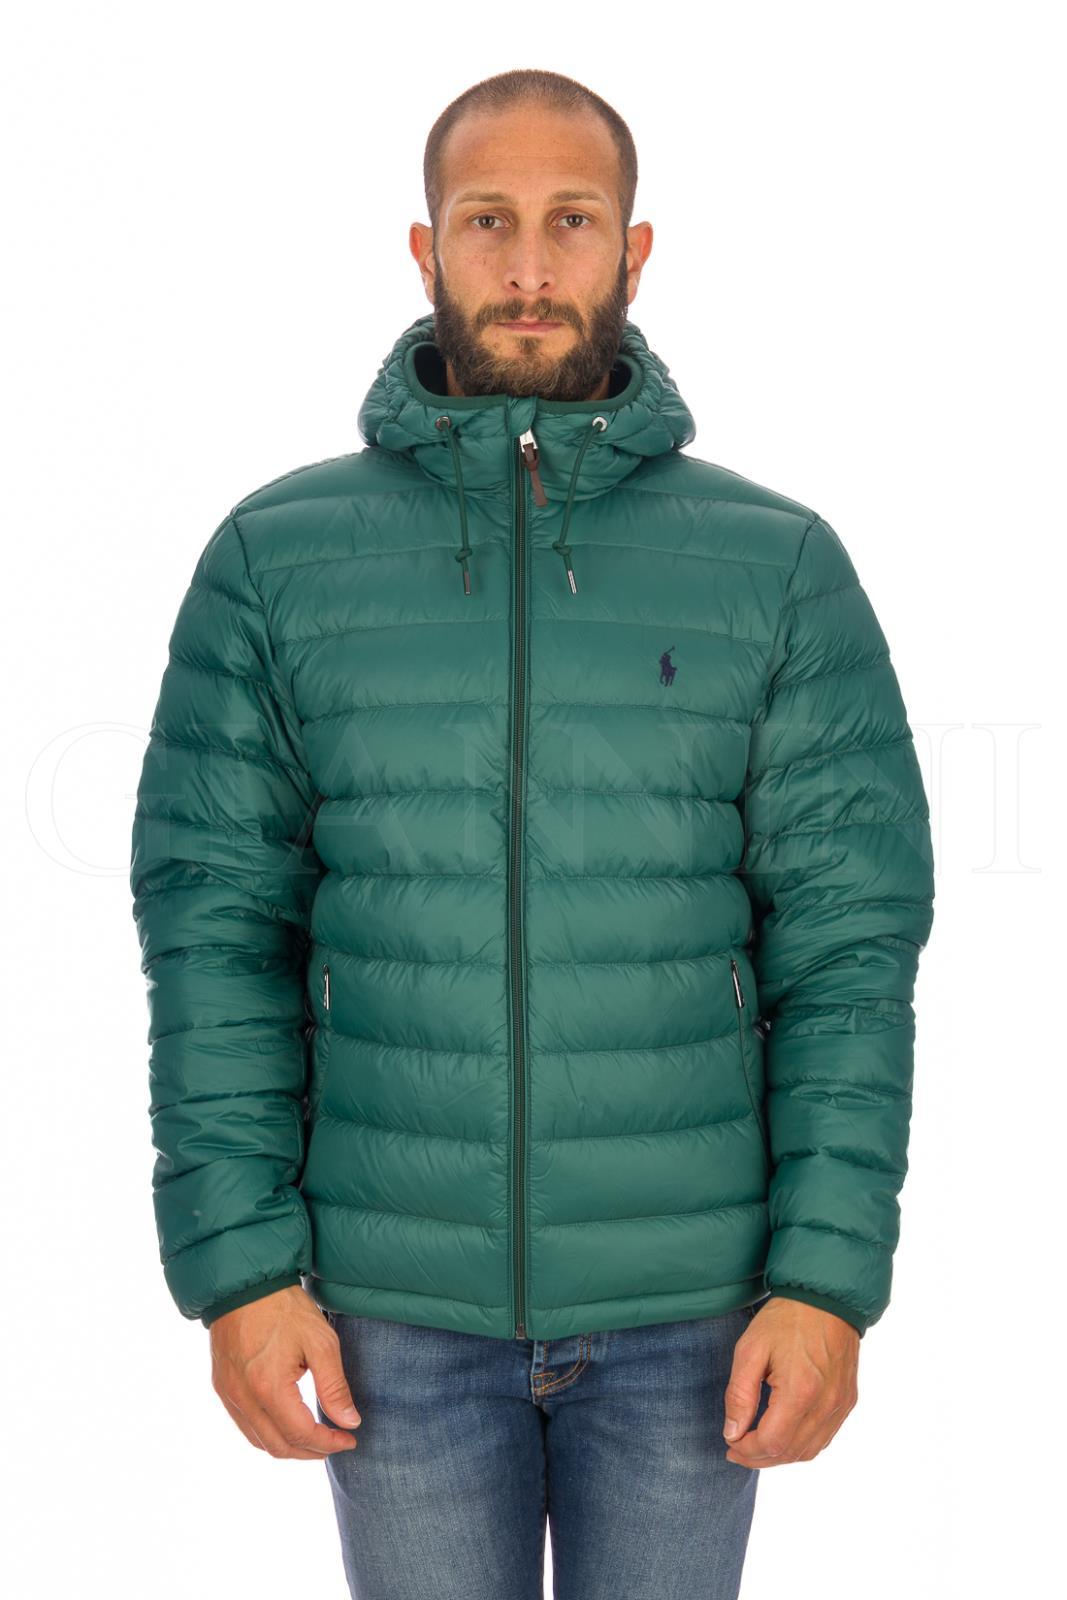 finest selection eed73 7b06f Polo Ralph Lauren Giubbotto 616255 | Giannini Shop Online